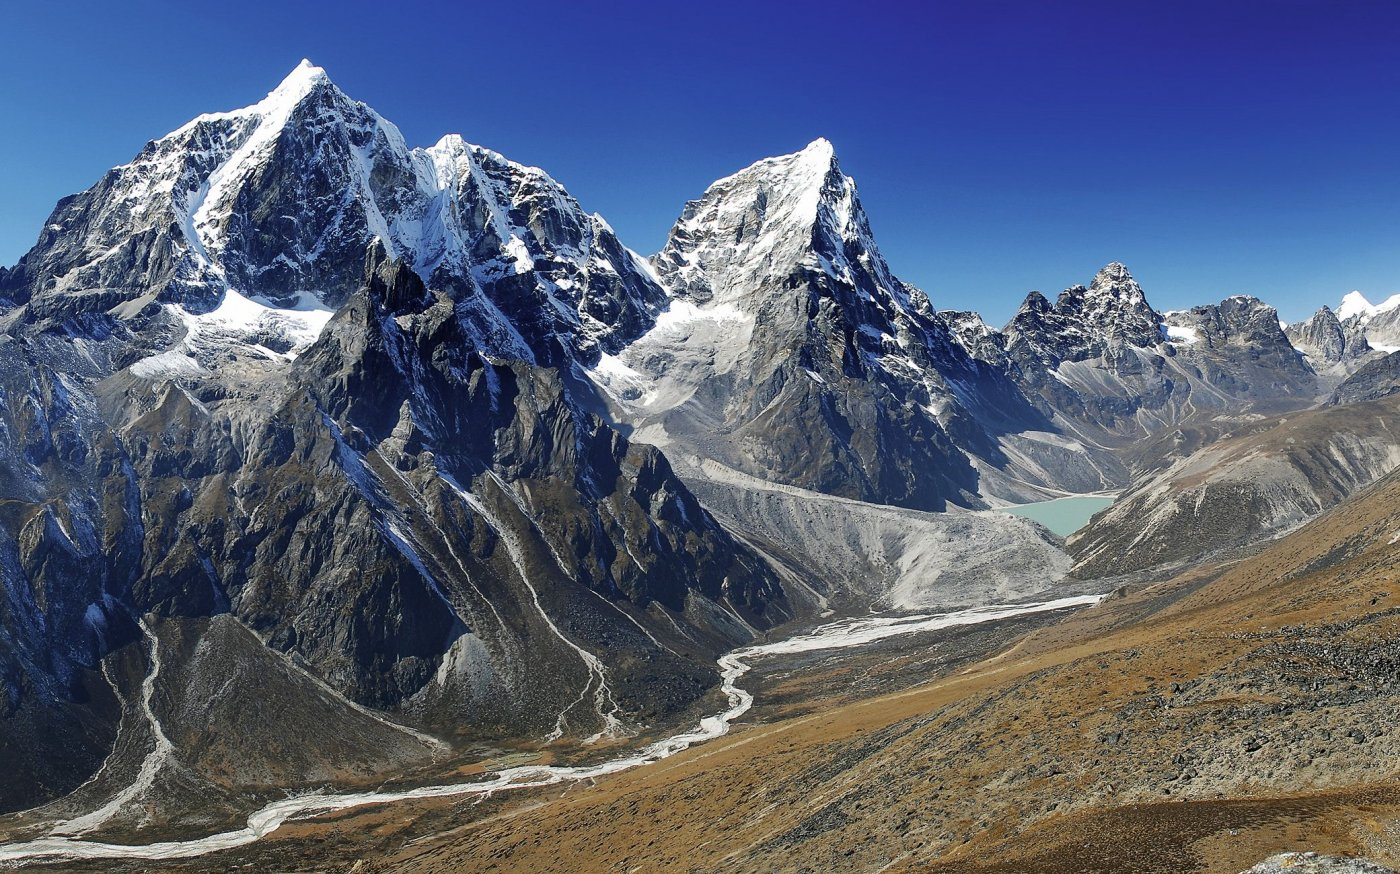 Фото Национальный парк Сагарматха. Непал, Eastern Region, Khumjung, Kala Pattar Ascent Trail